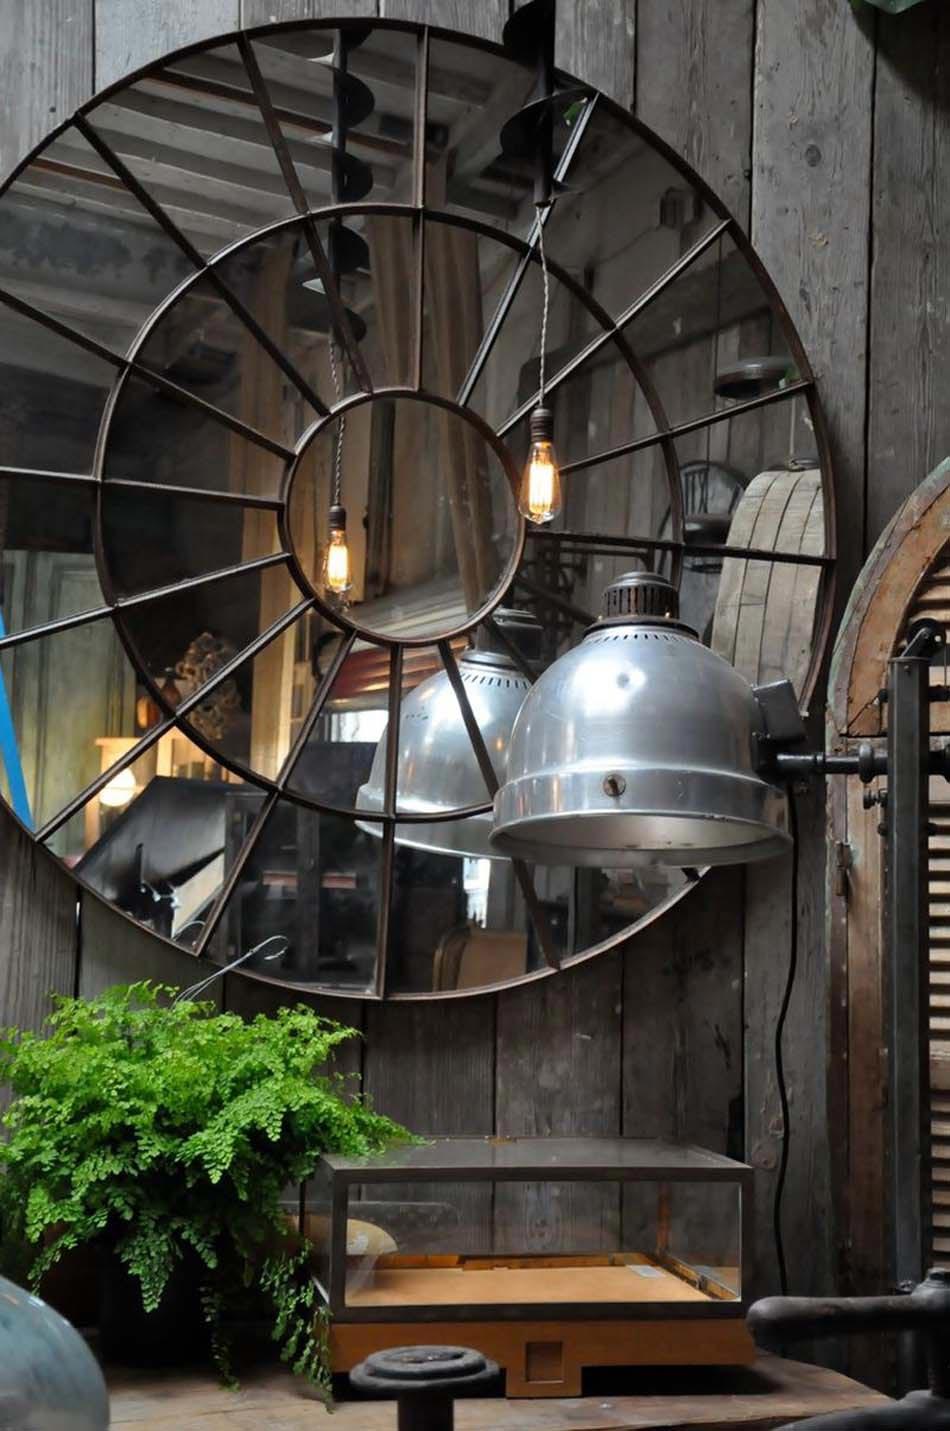 objets anciens steampunk deco